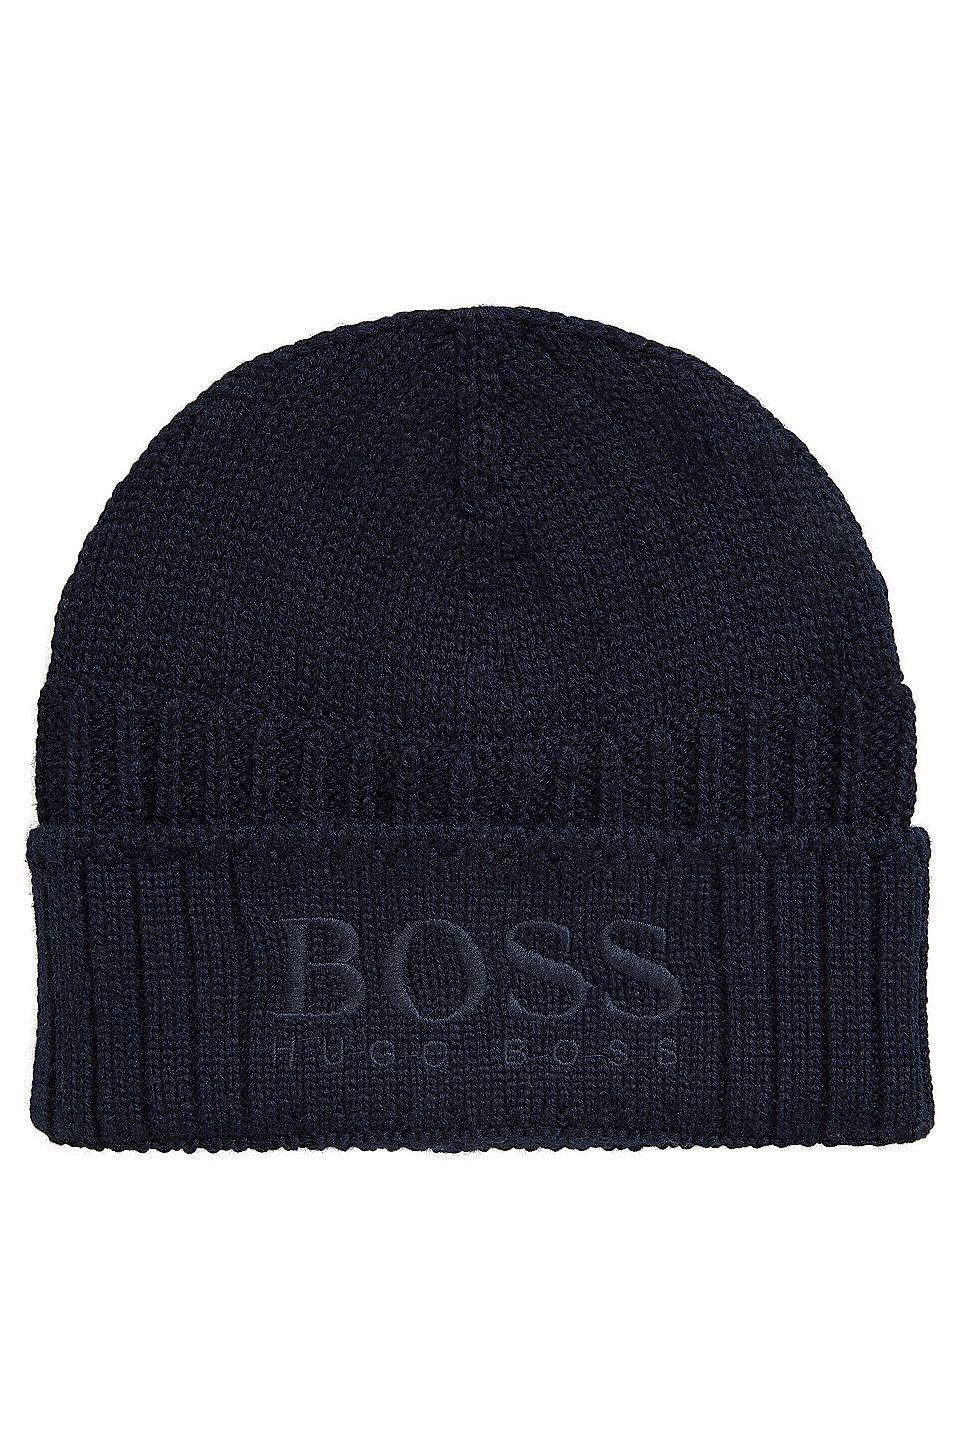 Knitted beanie hat with tonal logo, Dark Blue